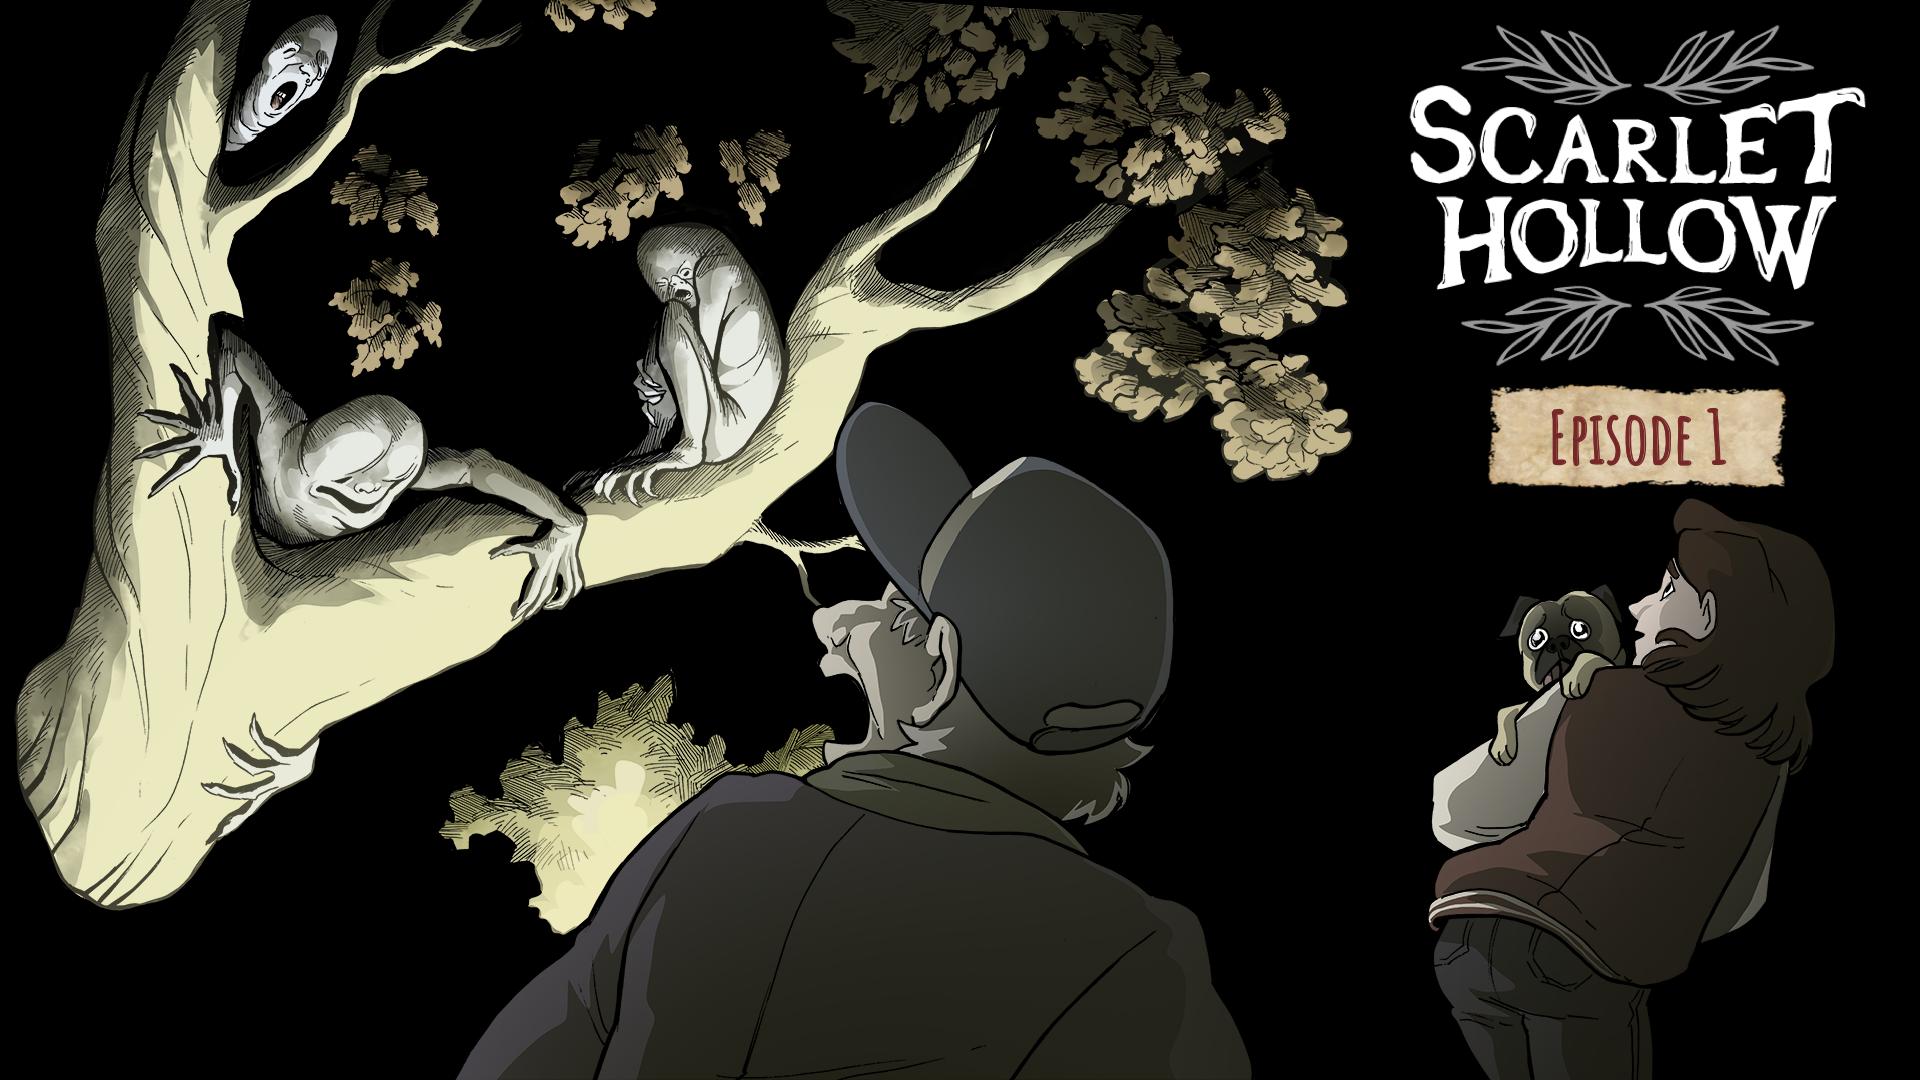 Scarlet Hollow: Episode 1